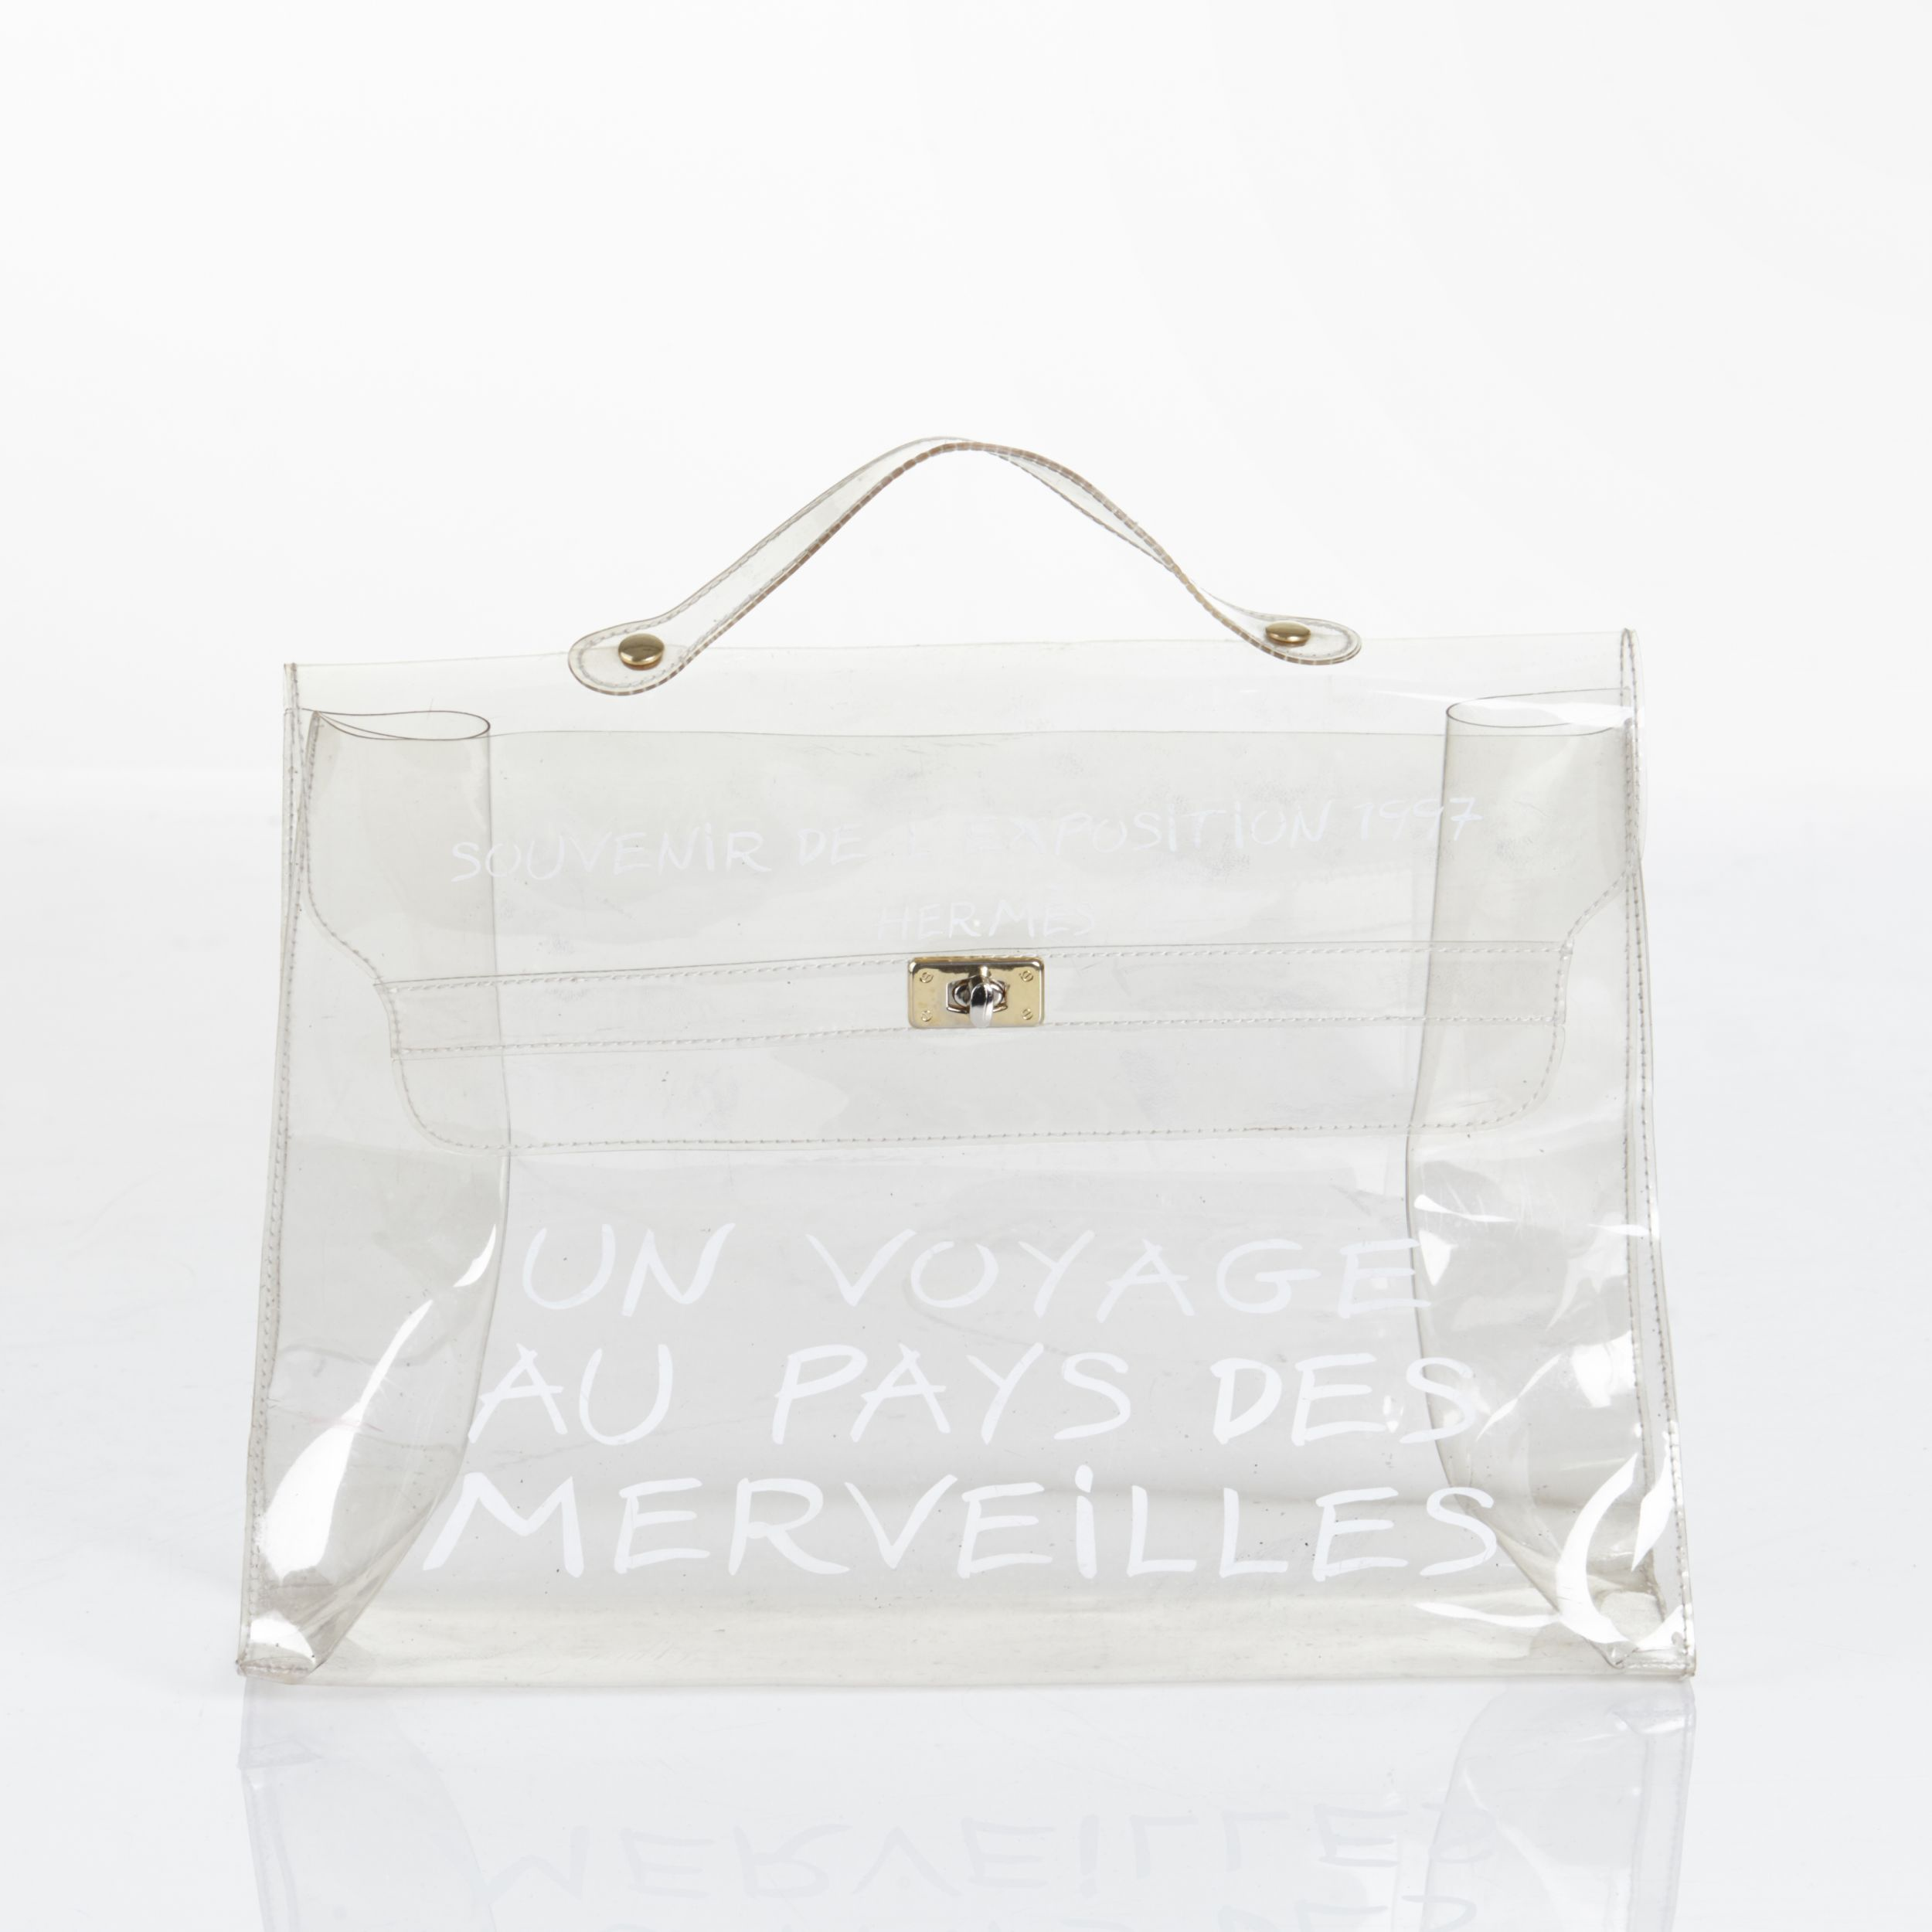 Hermès handväska Kelly Vinyl i PVC. Bild: Stockholms Auktionsverk